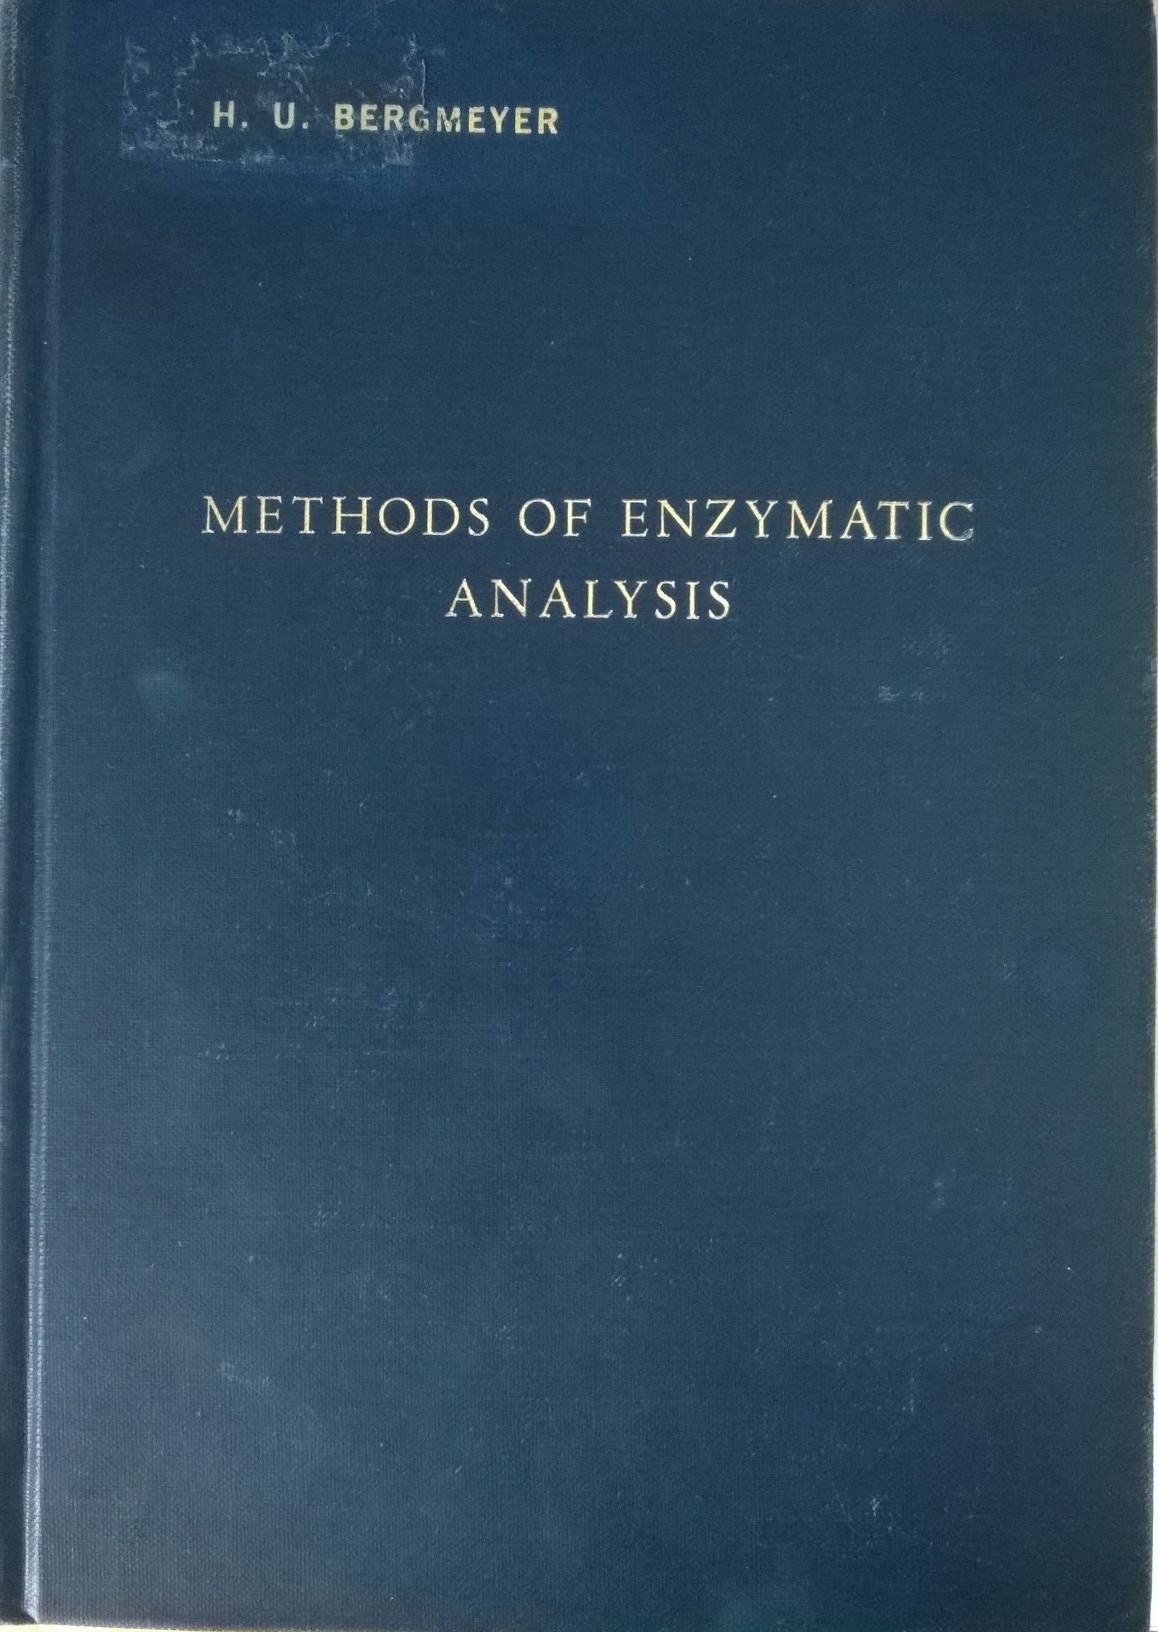 Methods of Enzymatic Analysis